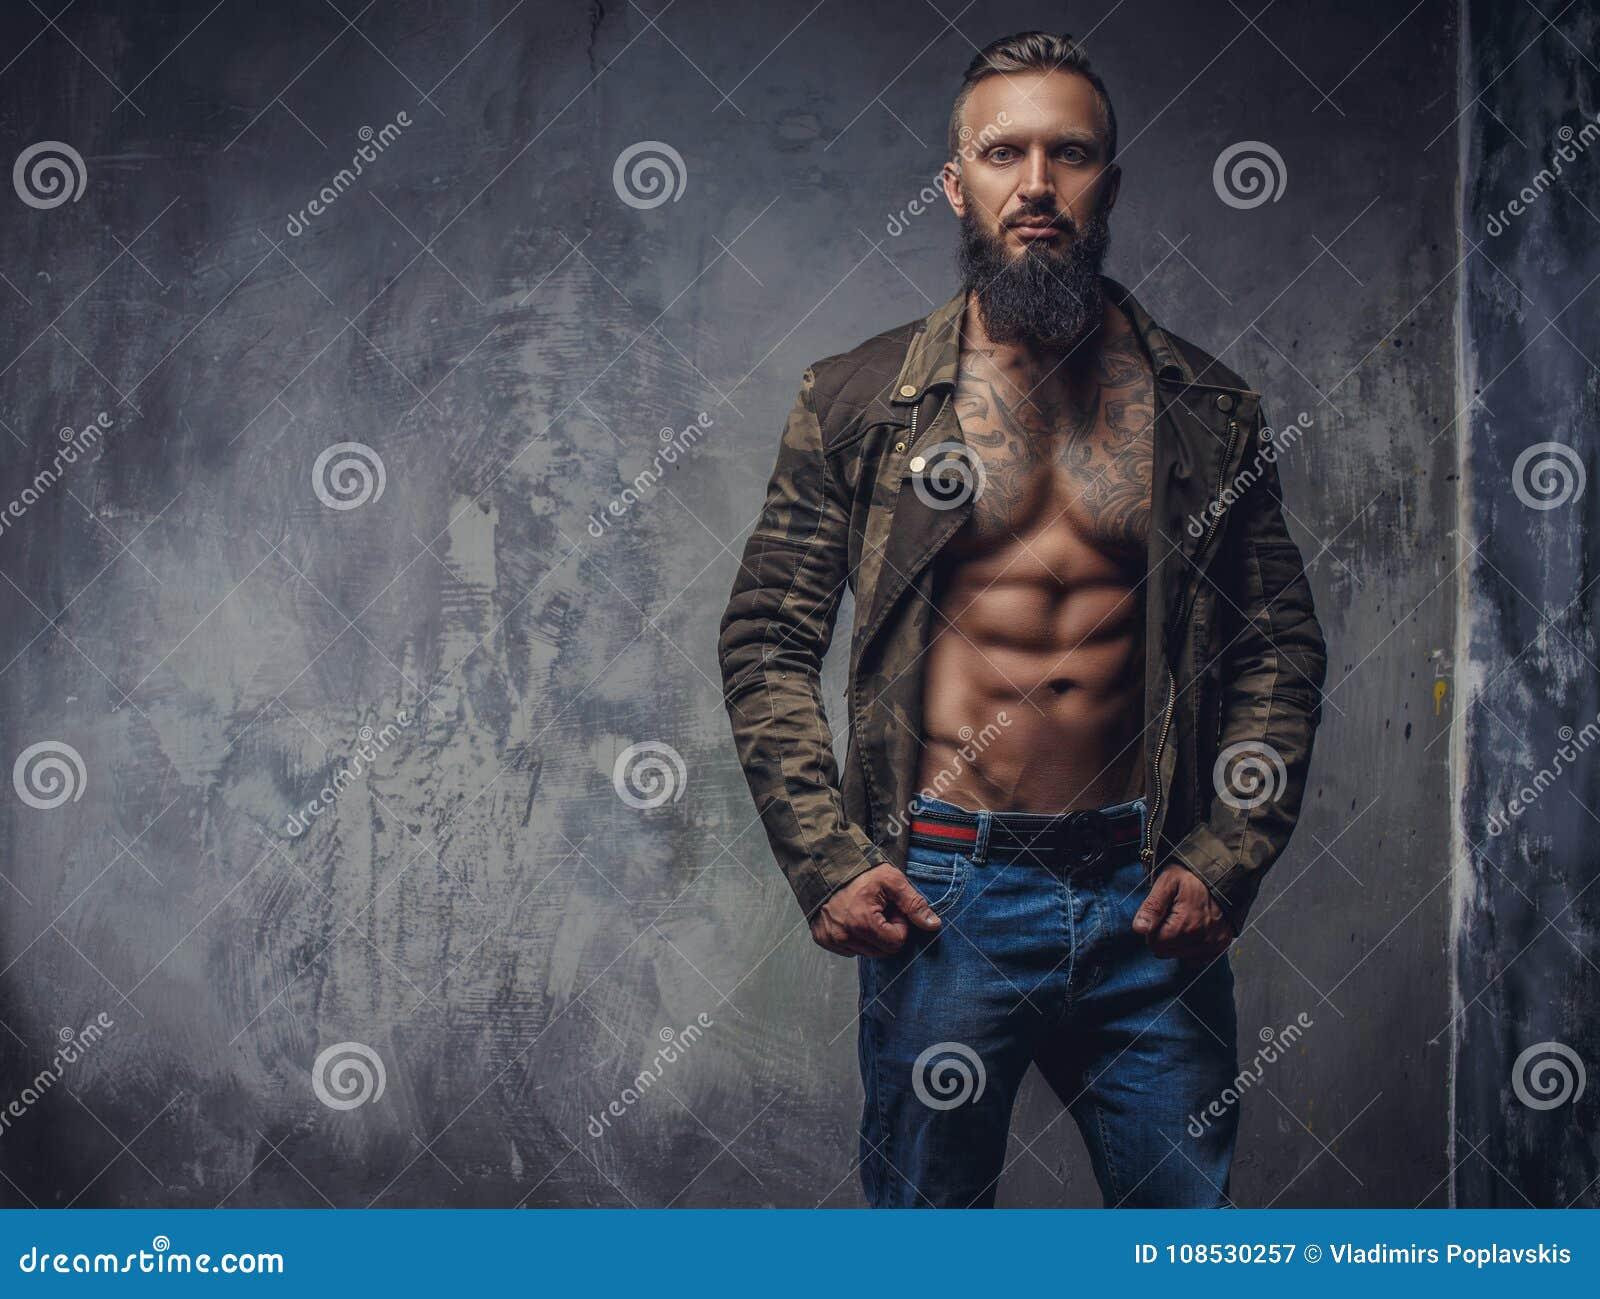 77fde92f2 Fashion Tattooed Man With Beard. Stock Image - Image of model ...